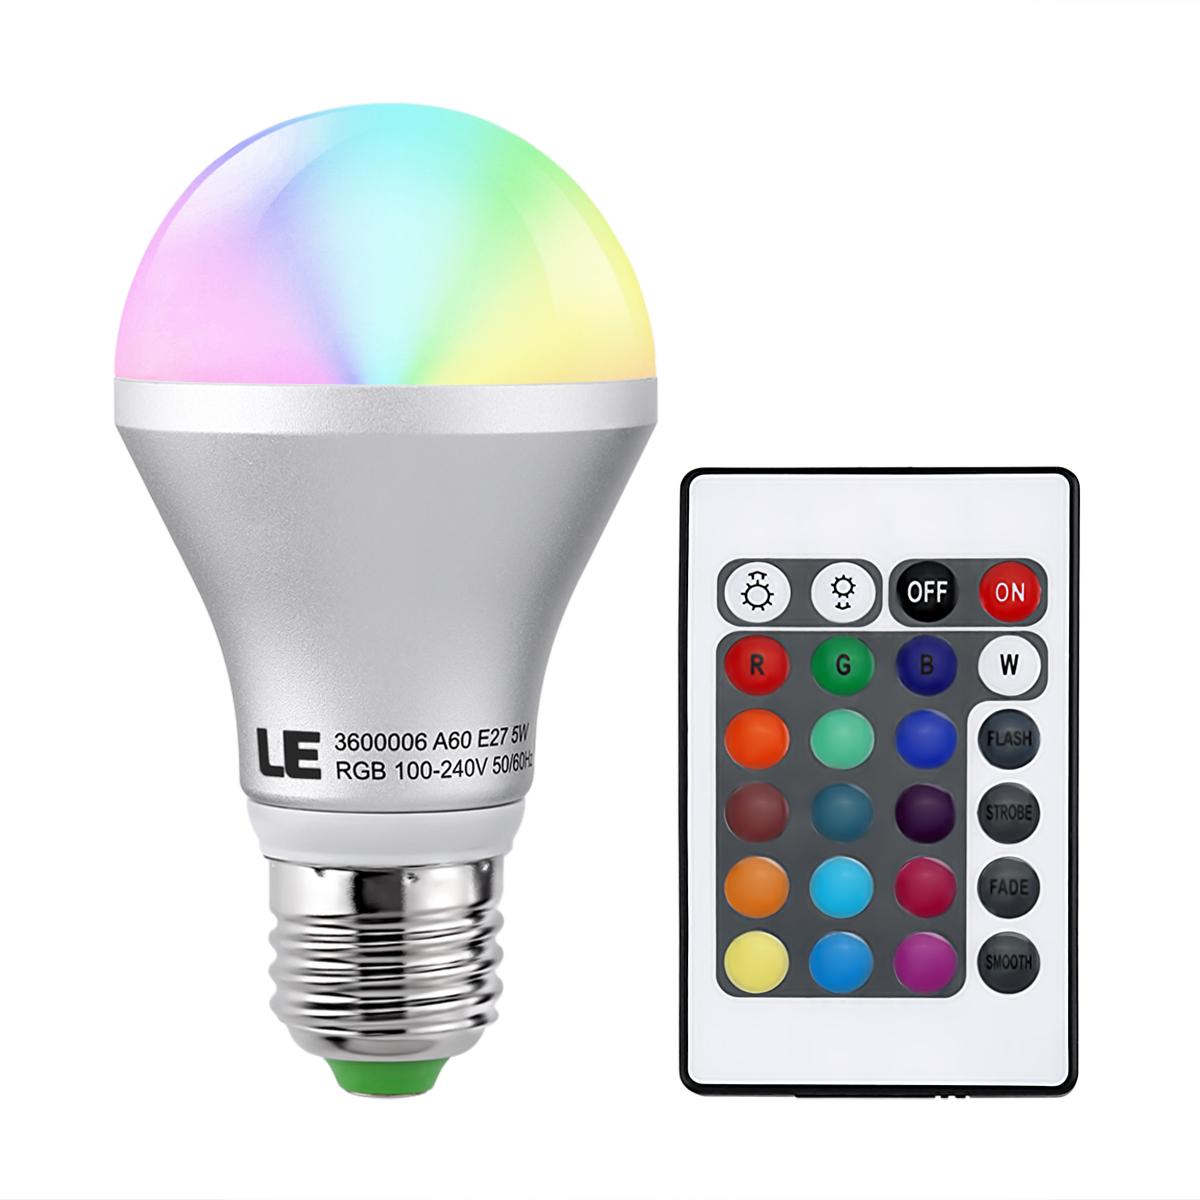 5W A60 E27 RGB LED Glühbirnen inkl. Fernbedienung, Dimmbar 16 Farben, Stimmungslicht